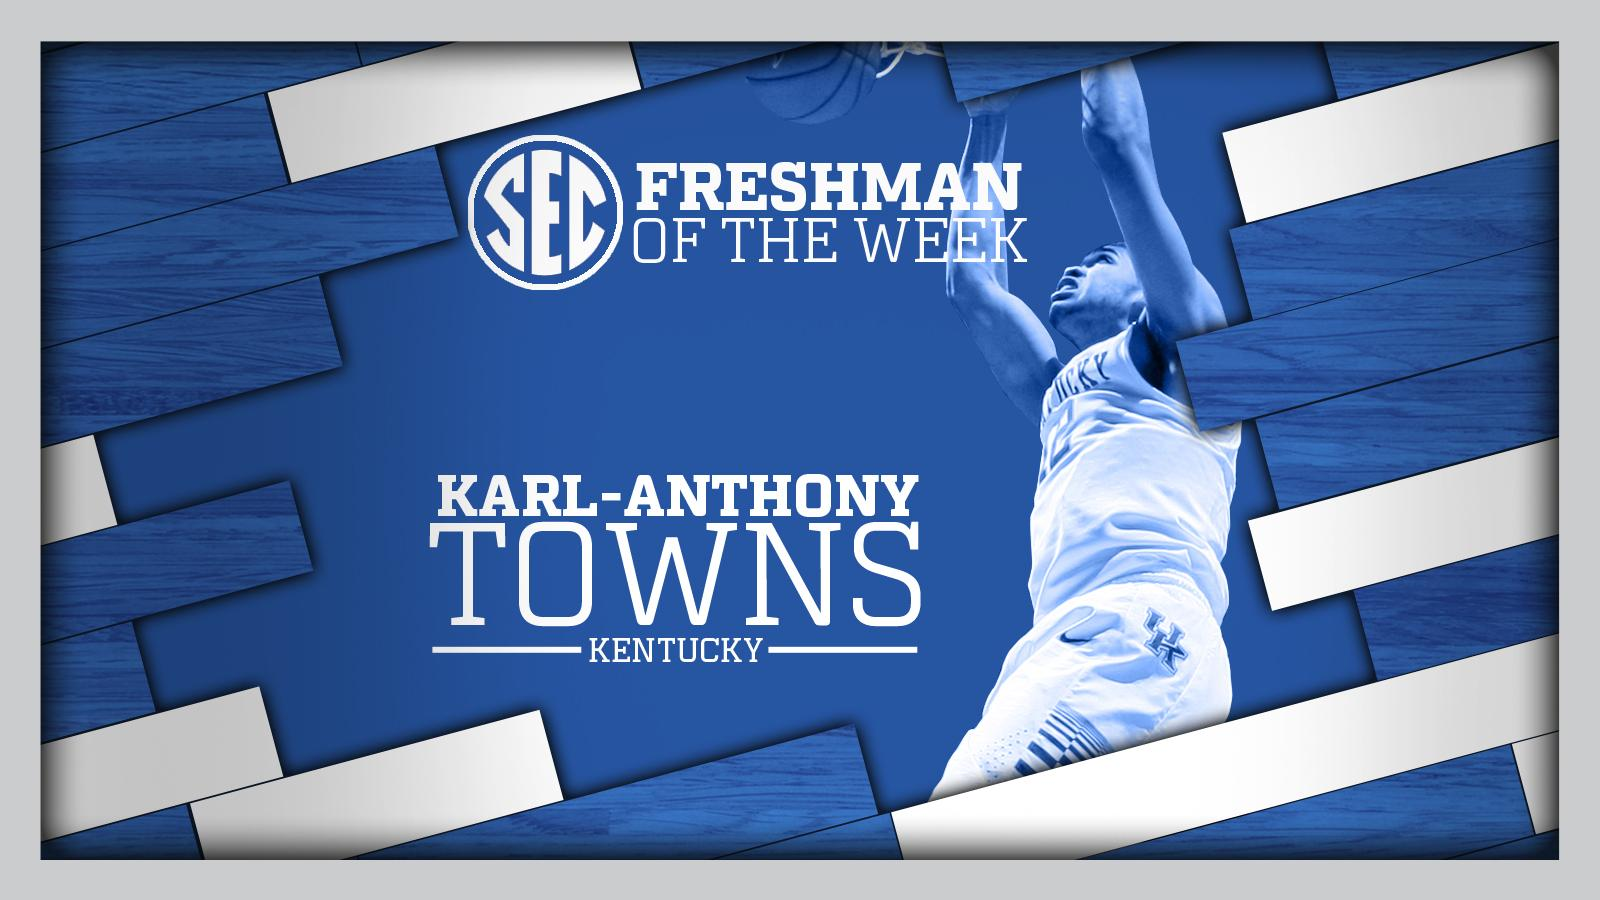 Kentucky Basketball Fox Named Sec Freshman Of The Week: Karl Towns Is The SEC Freshman Of The Week